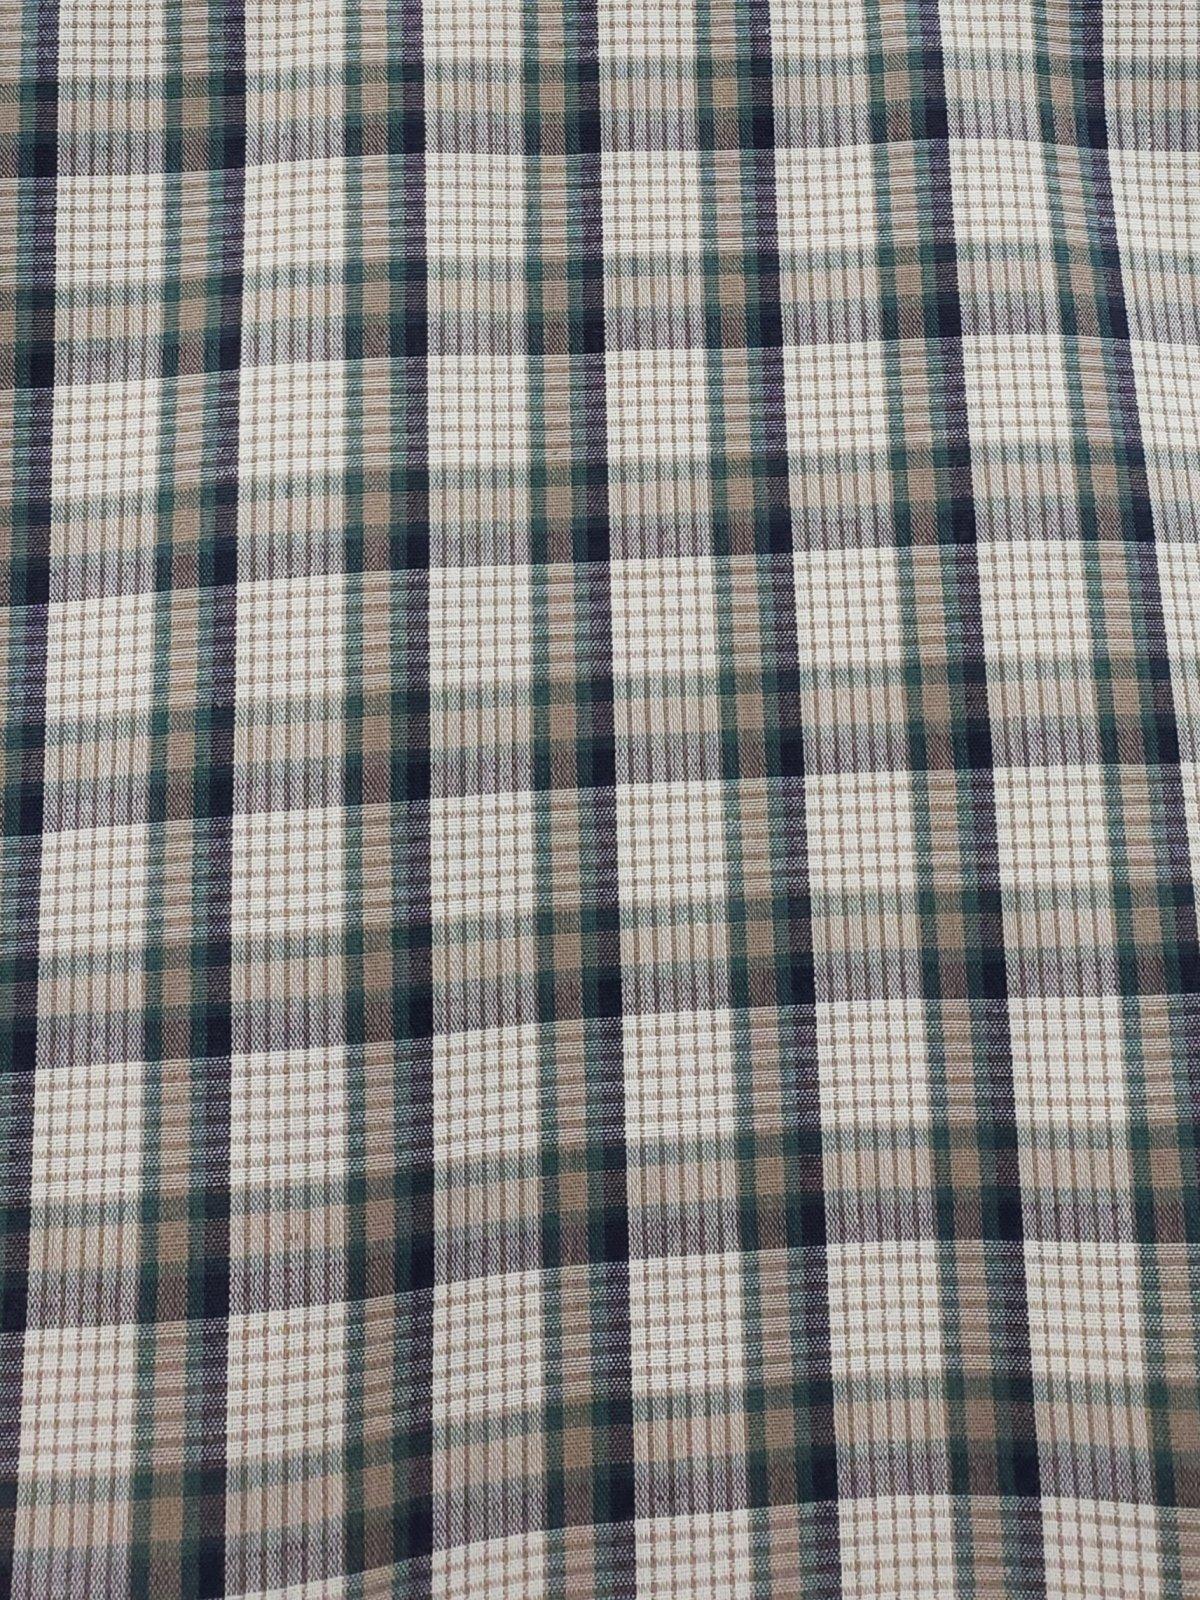 Blue Green Plaid 115cm 65%Polyester/35%Cotton 01043758